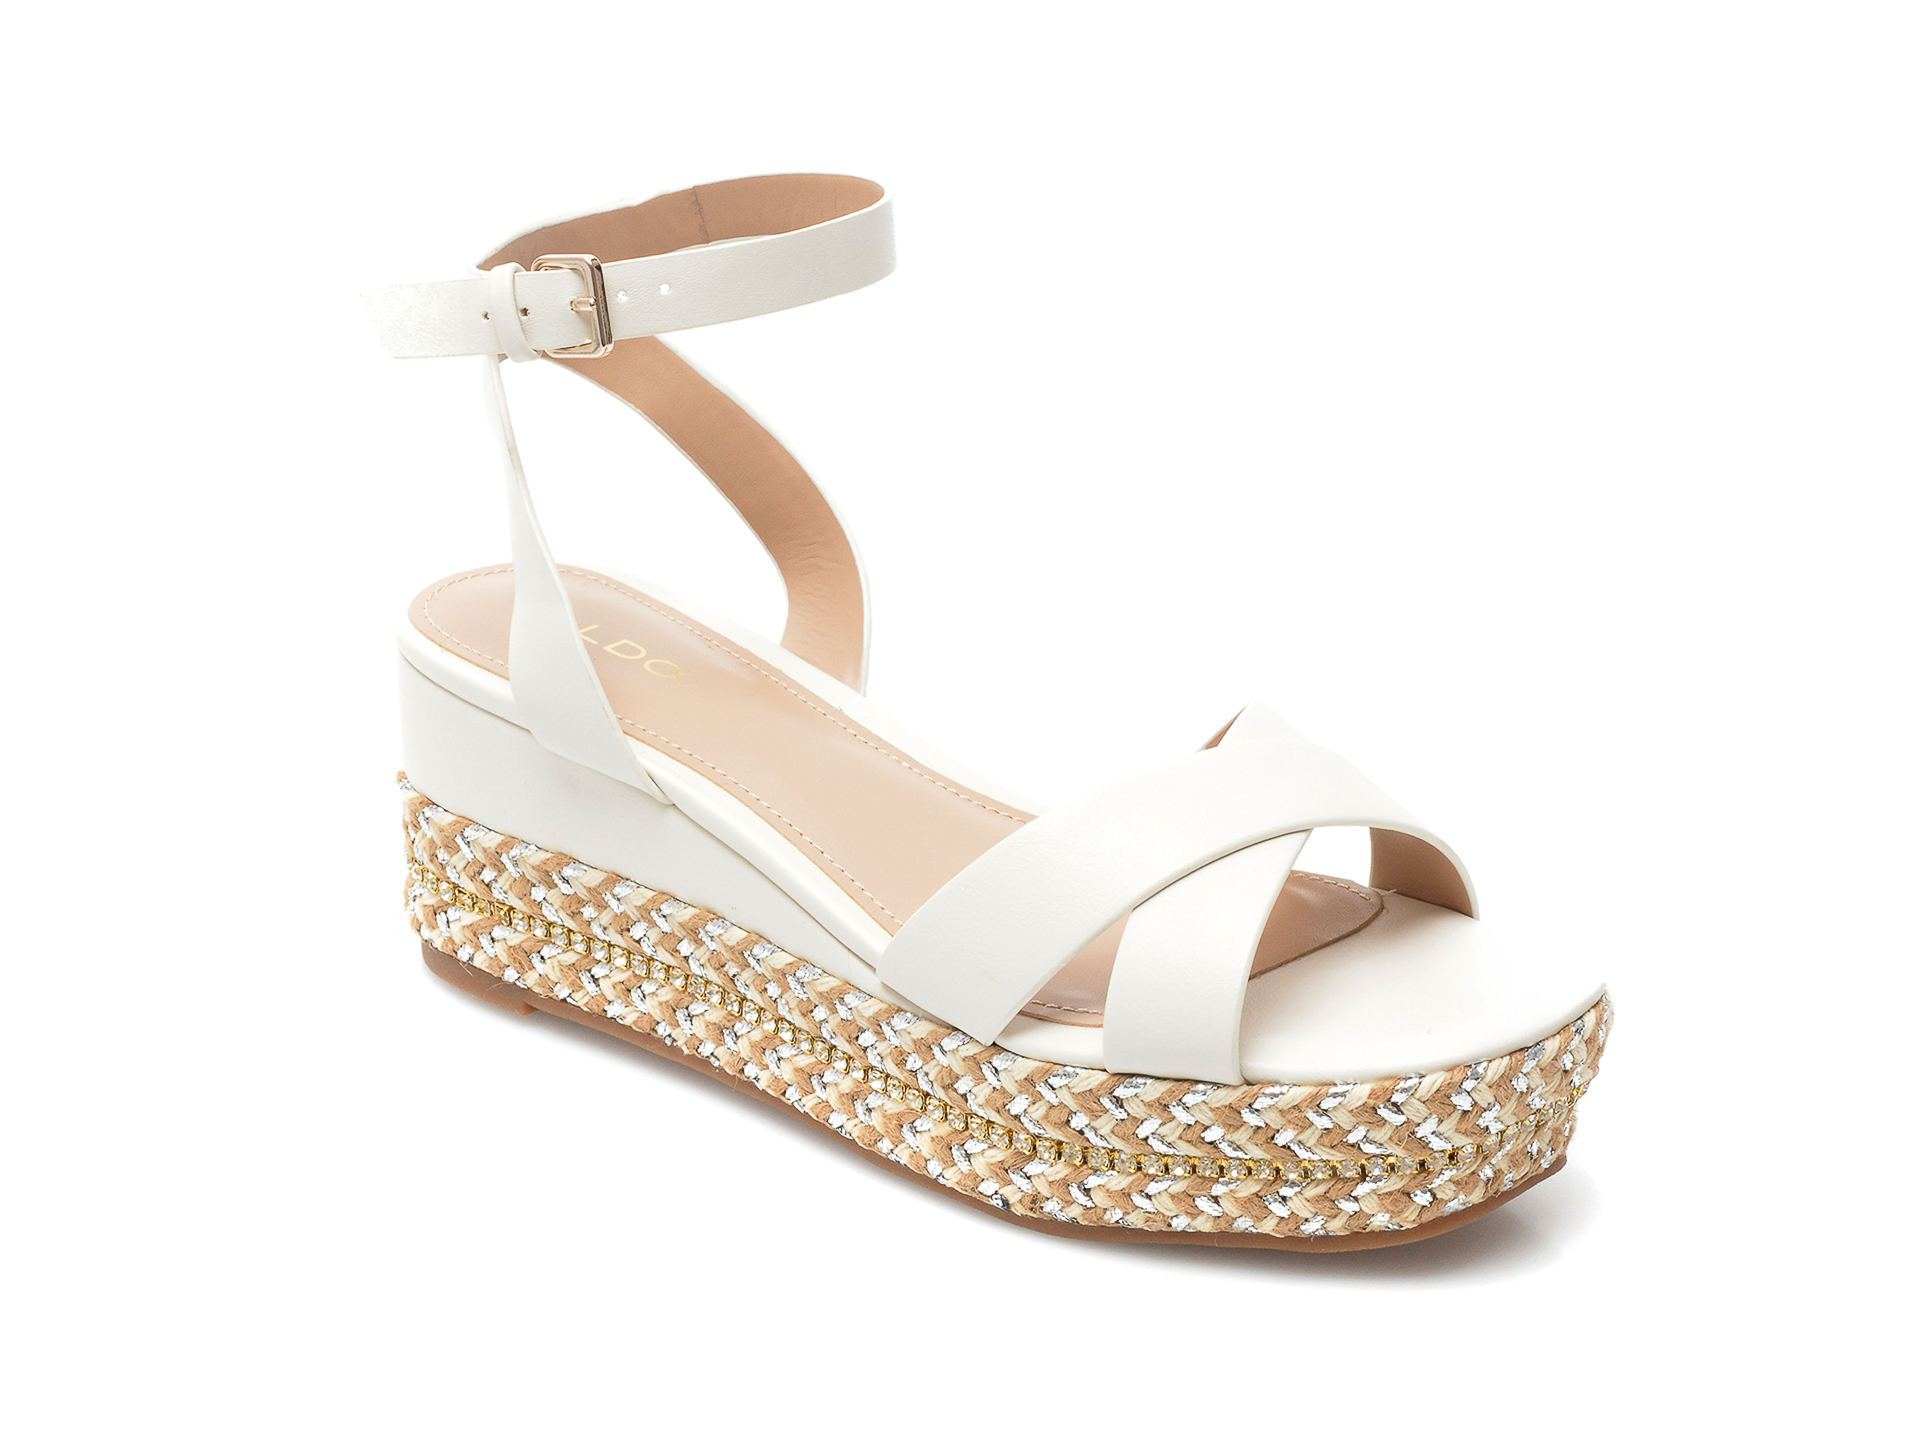 Sandale ALDO albe, Launia100, din piele ecologica imagine otter.ro 2021